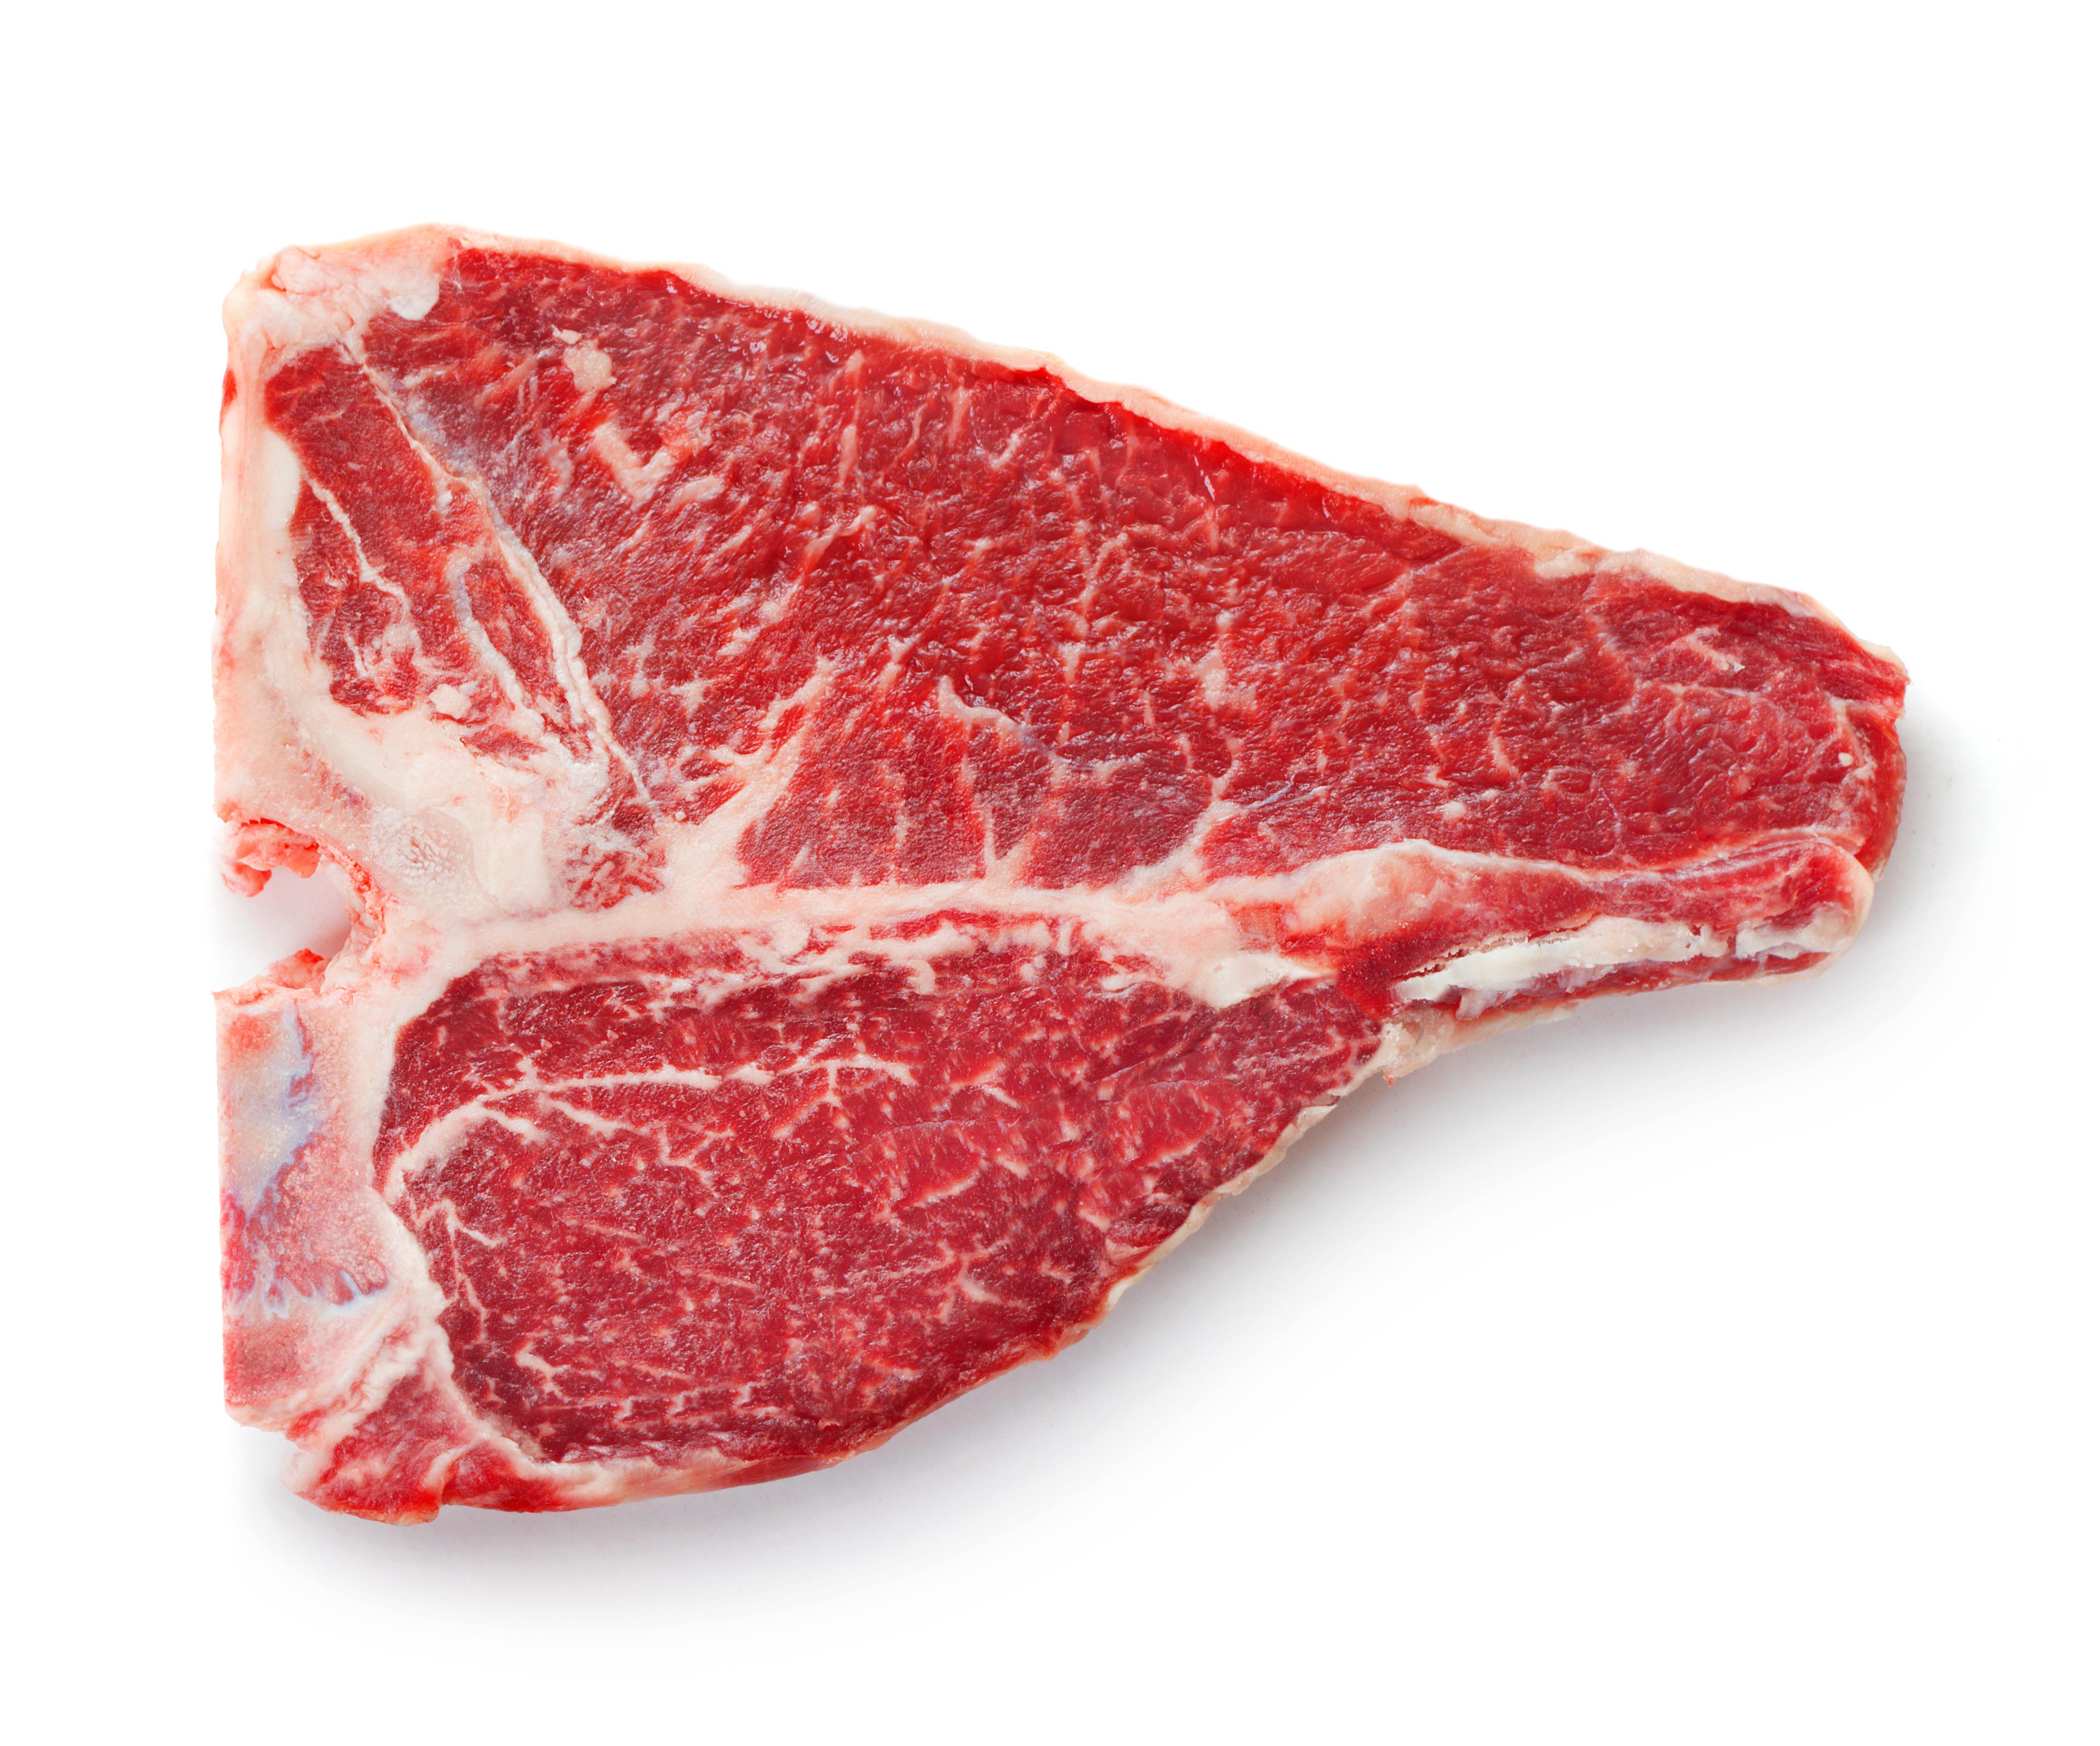 fresh raw t-bone beef steak isolated on white background